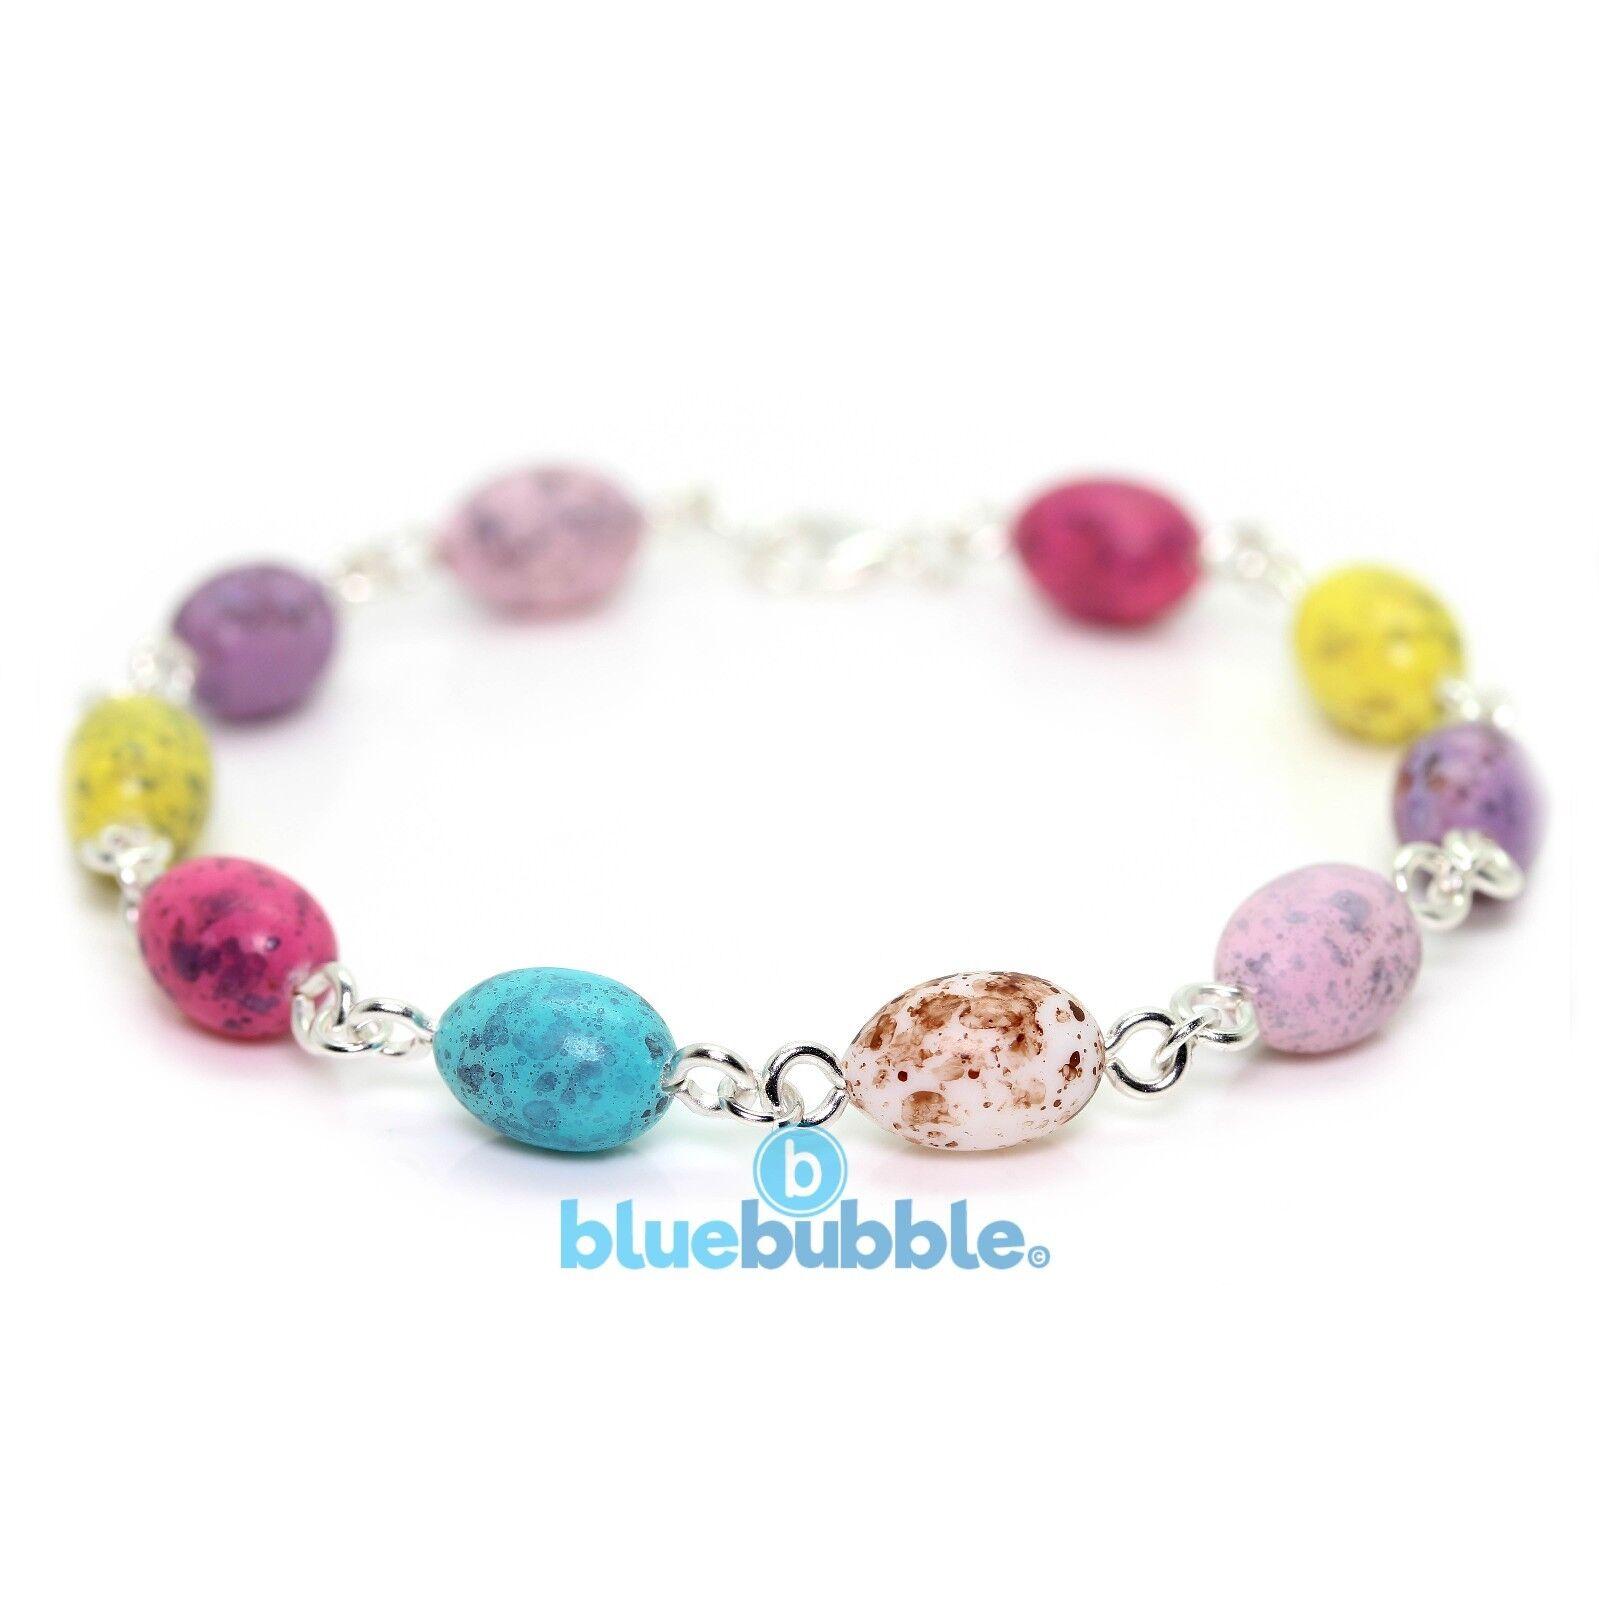 Bluebubble MINI SWEET TREAT Bracelet Cute Kawaii Novelty Fun